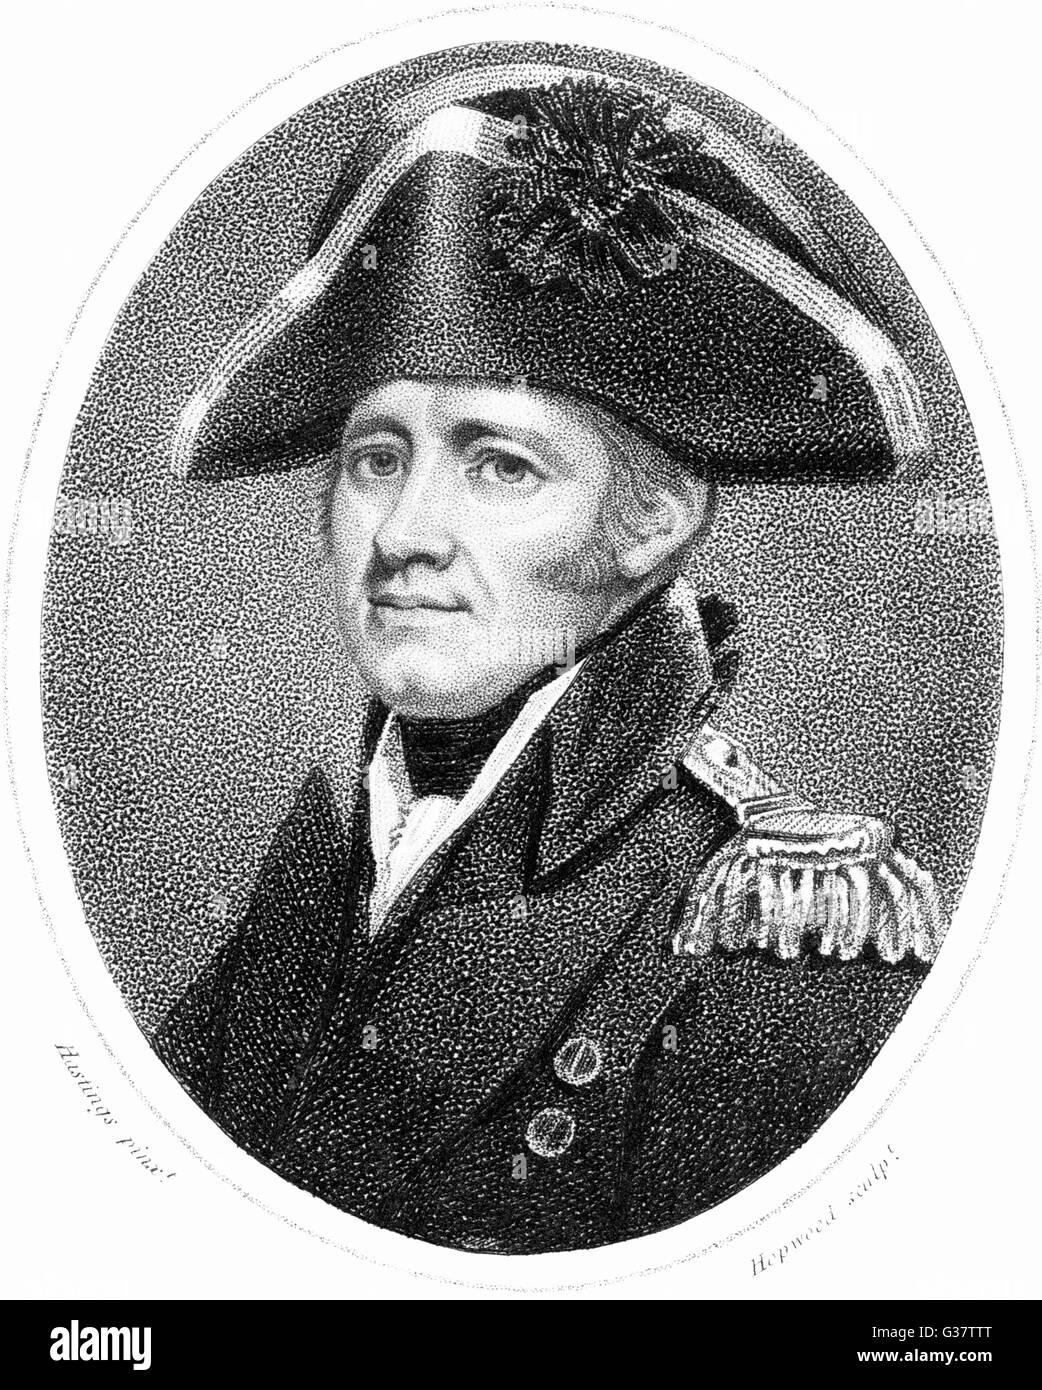 SIR HOME RIGGS POPHAM -  British sailor.        Date:  1762 - 1820 Stock Photo